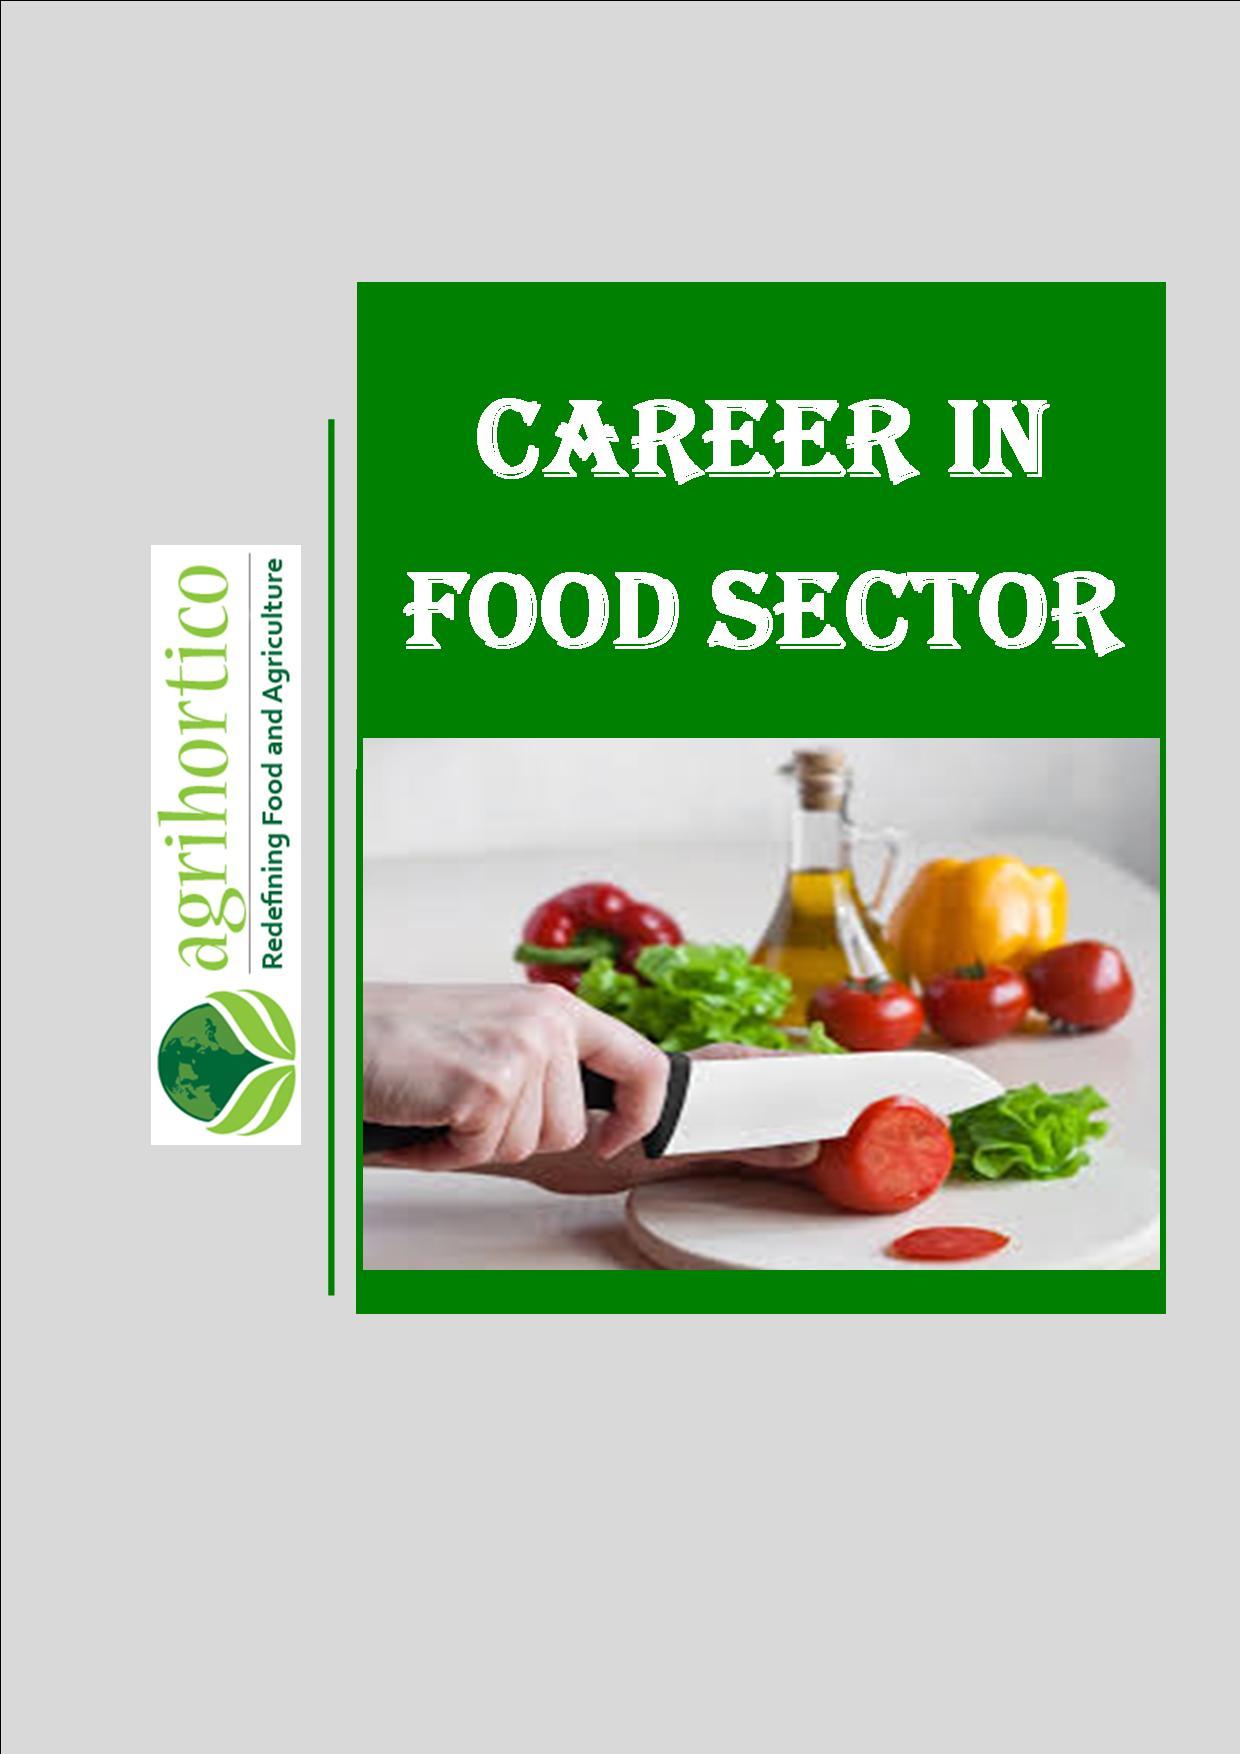 career-in-food-sector